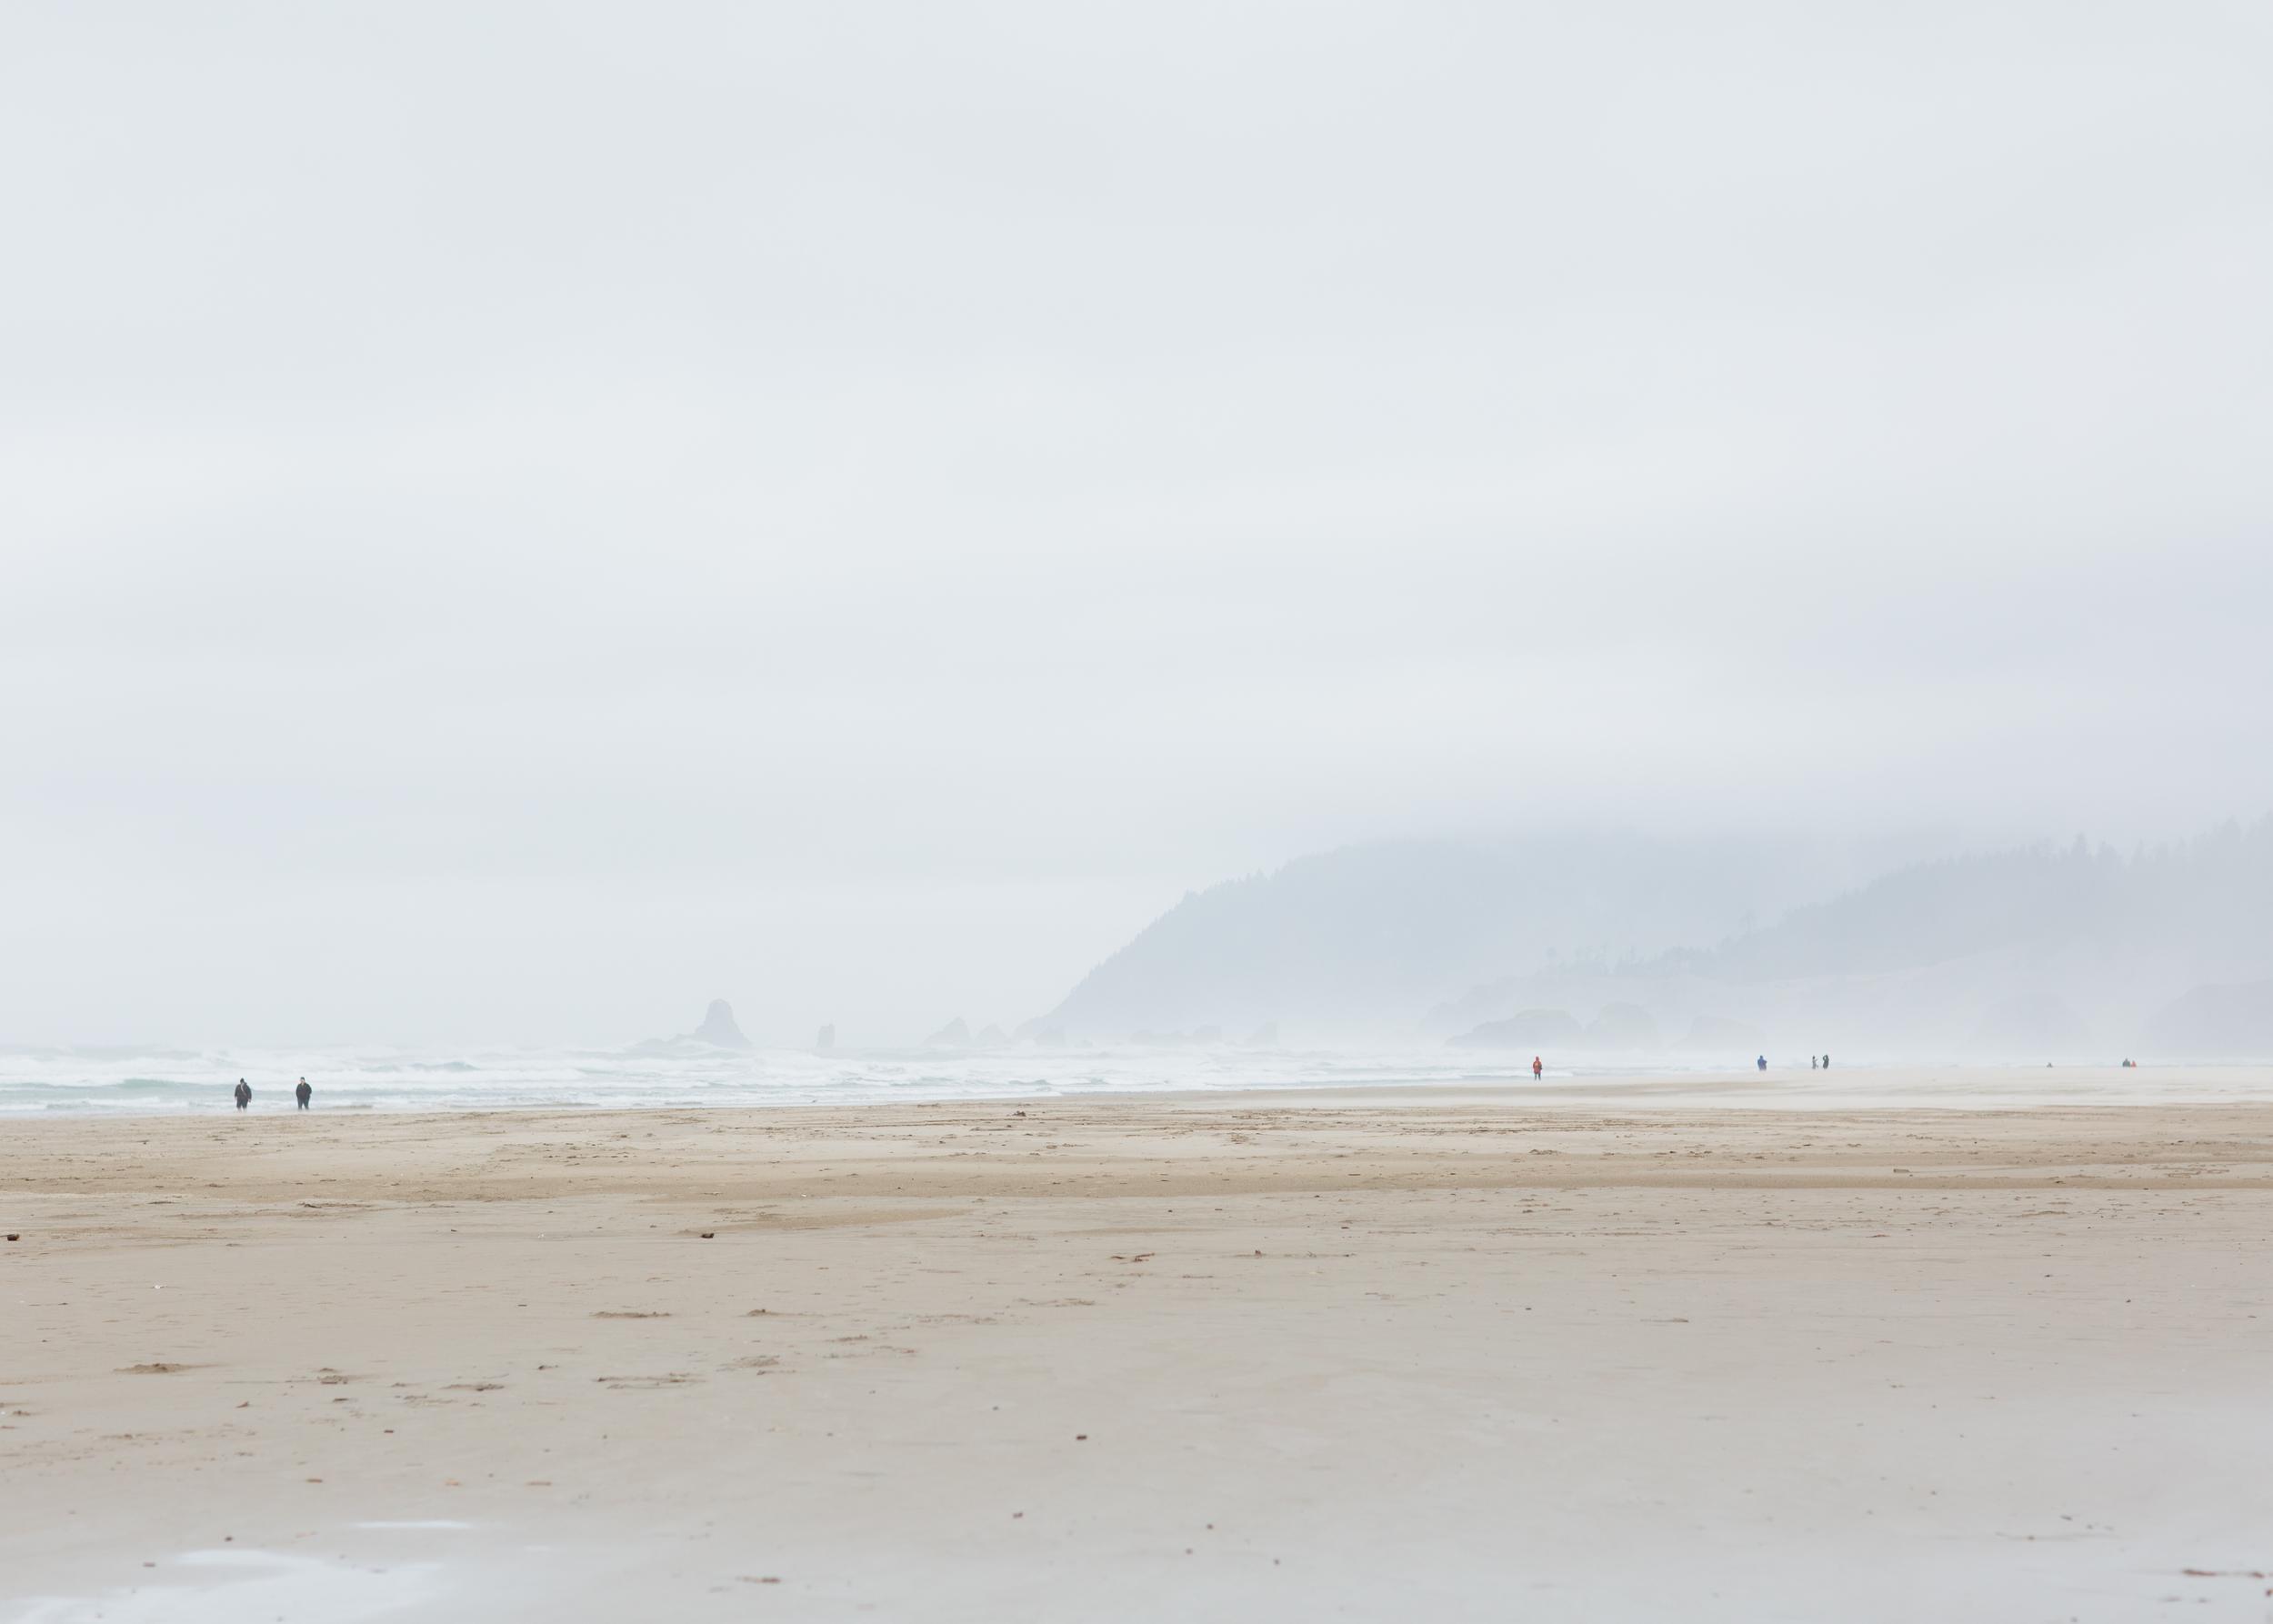 cannon-beach-3.jpg